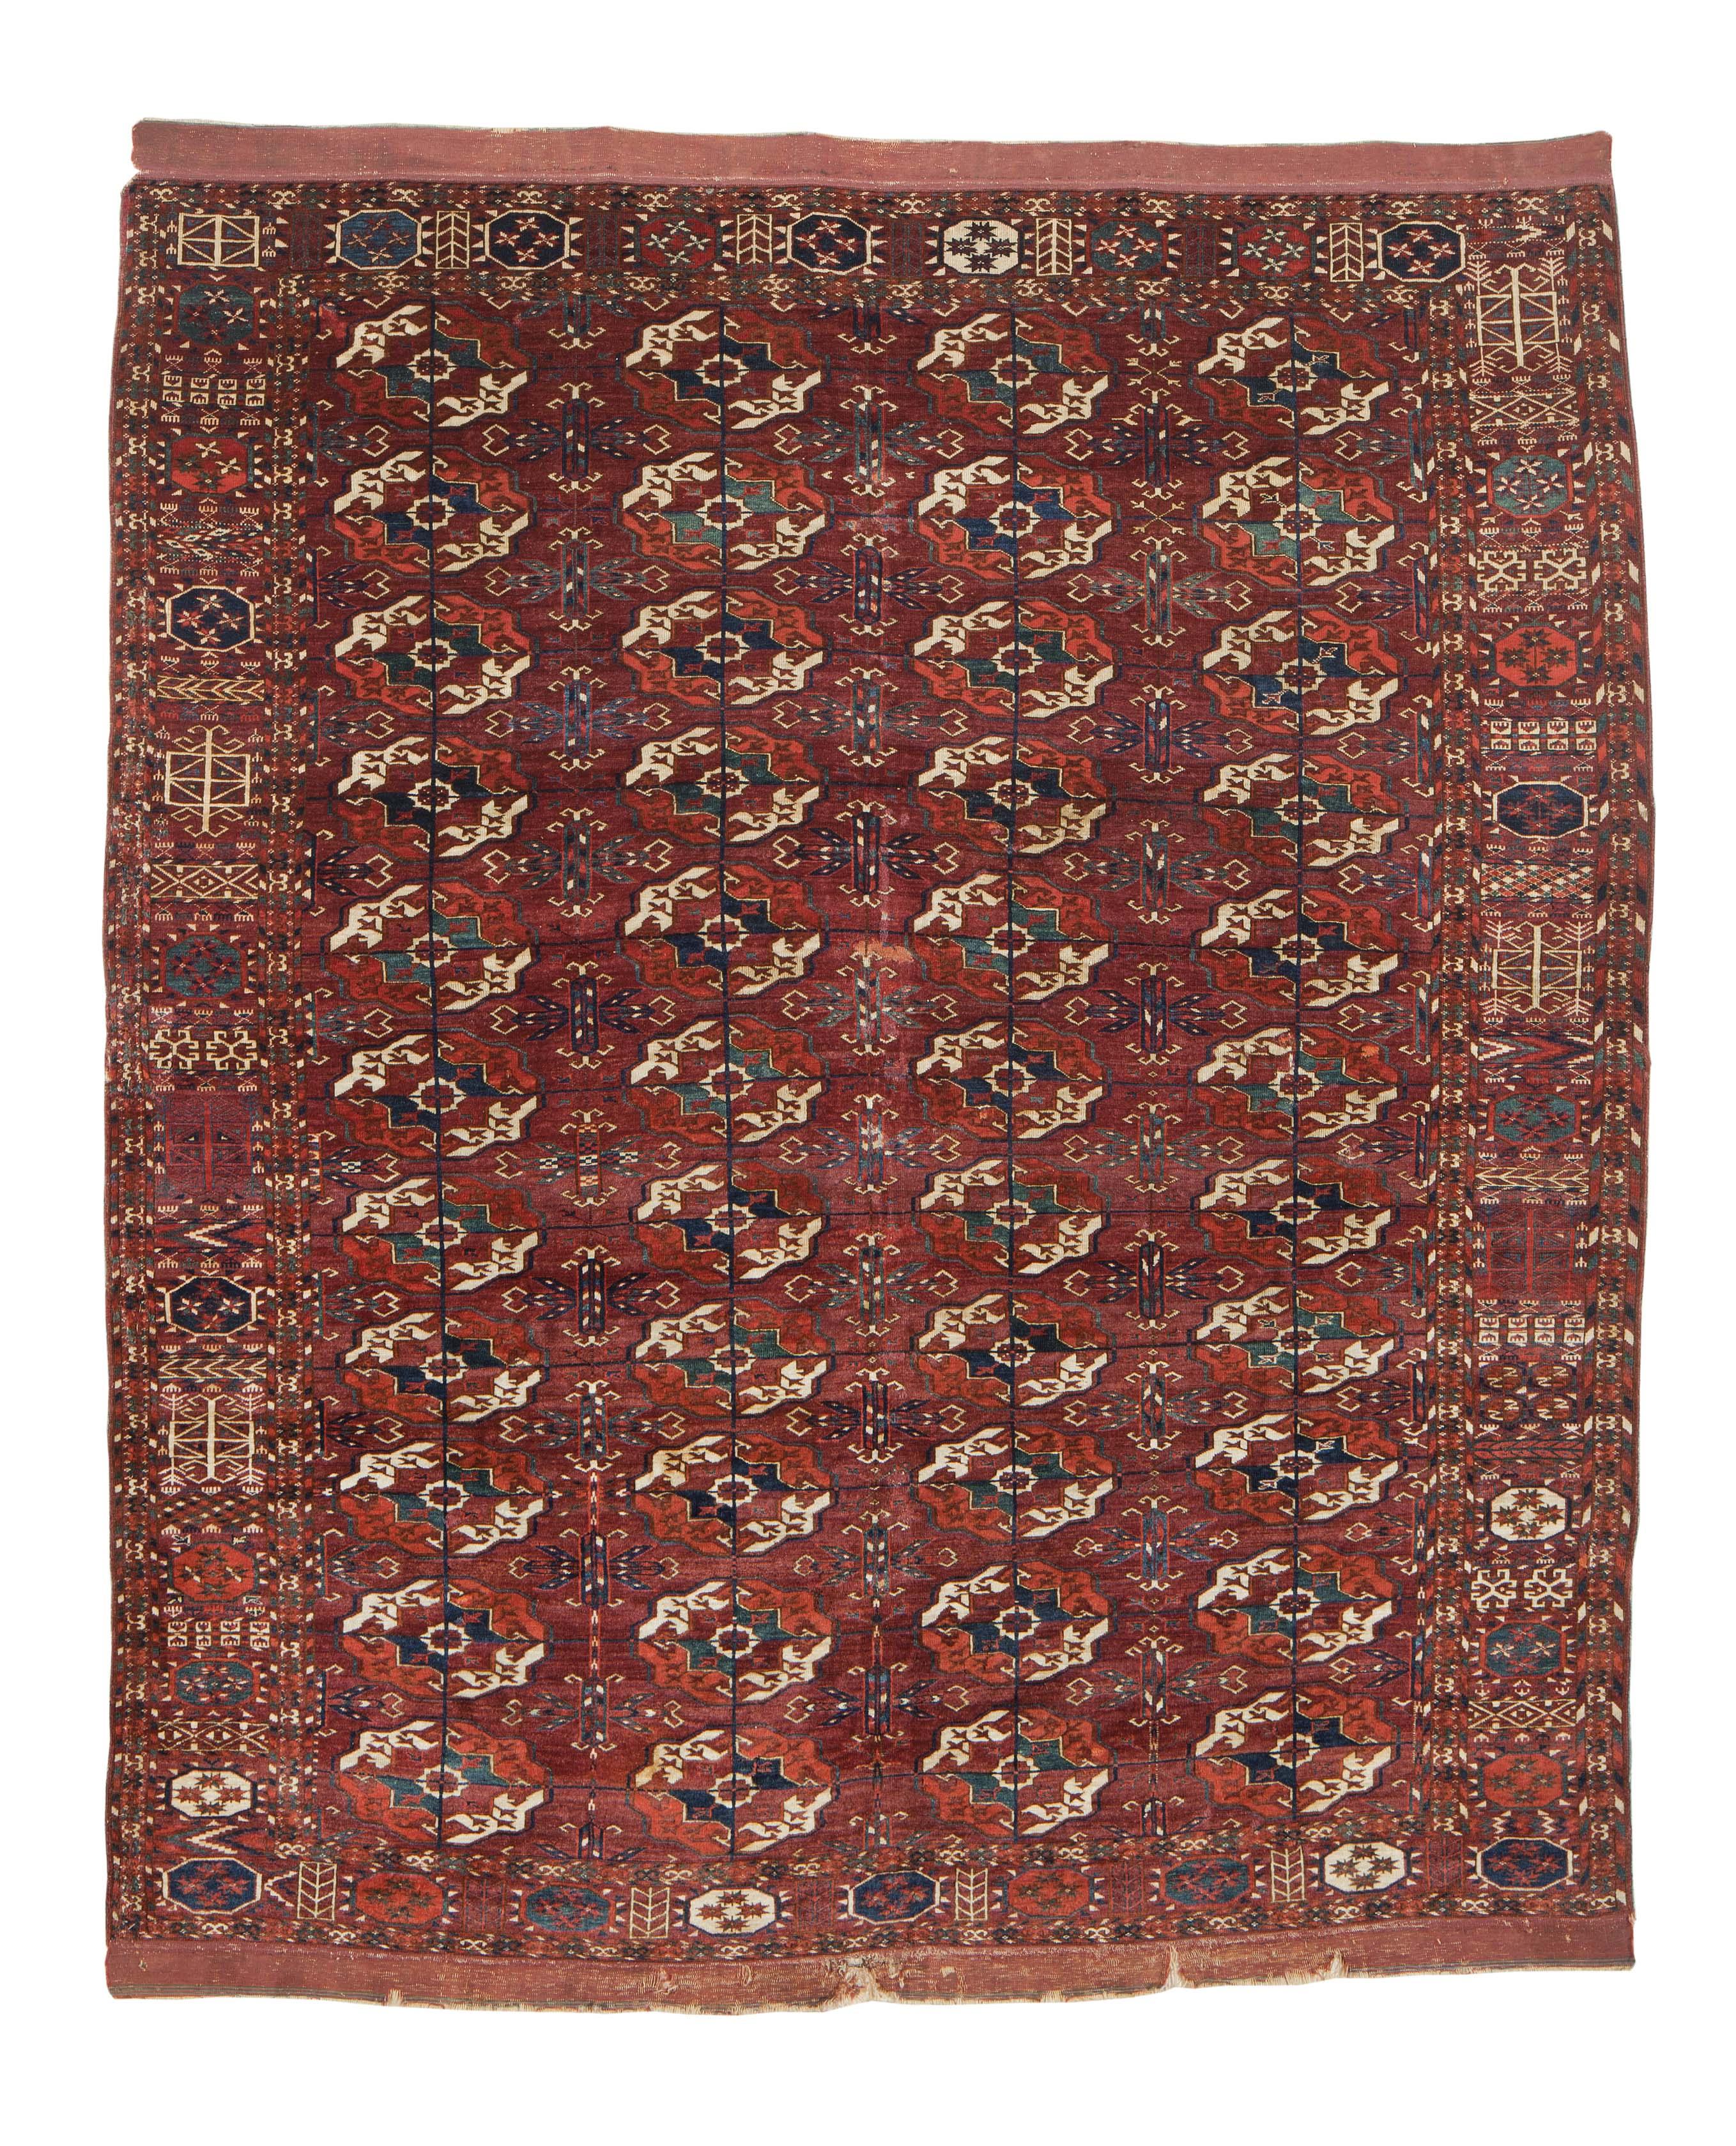 Tekke Turkmen main carpet, 18th/19th century. Ali Foumani, Amsterdam